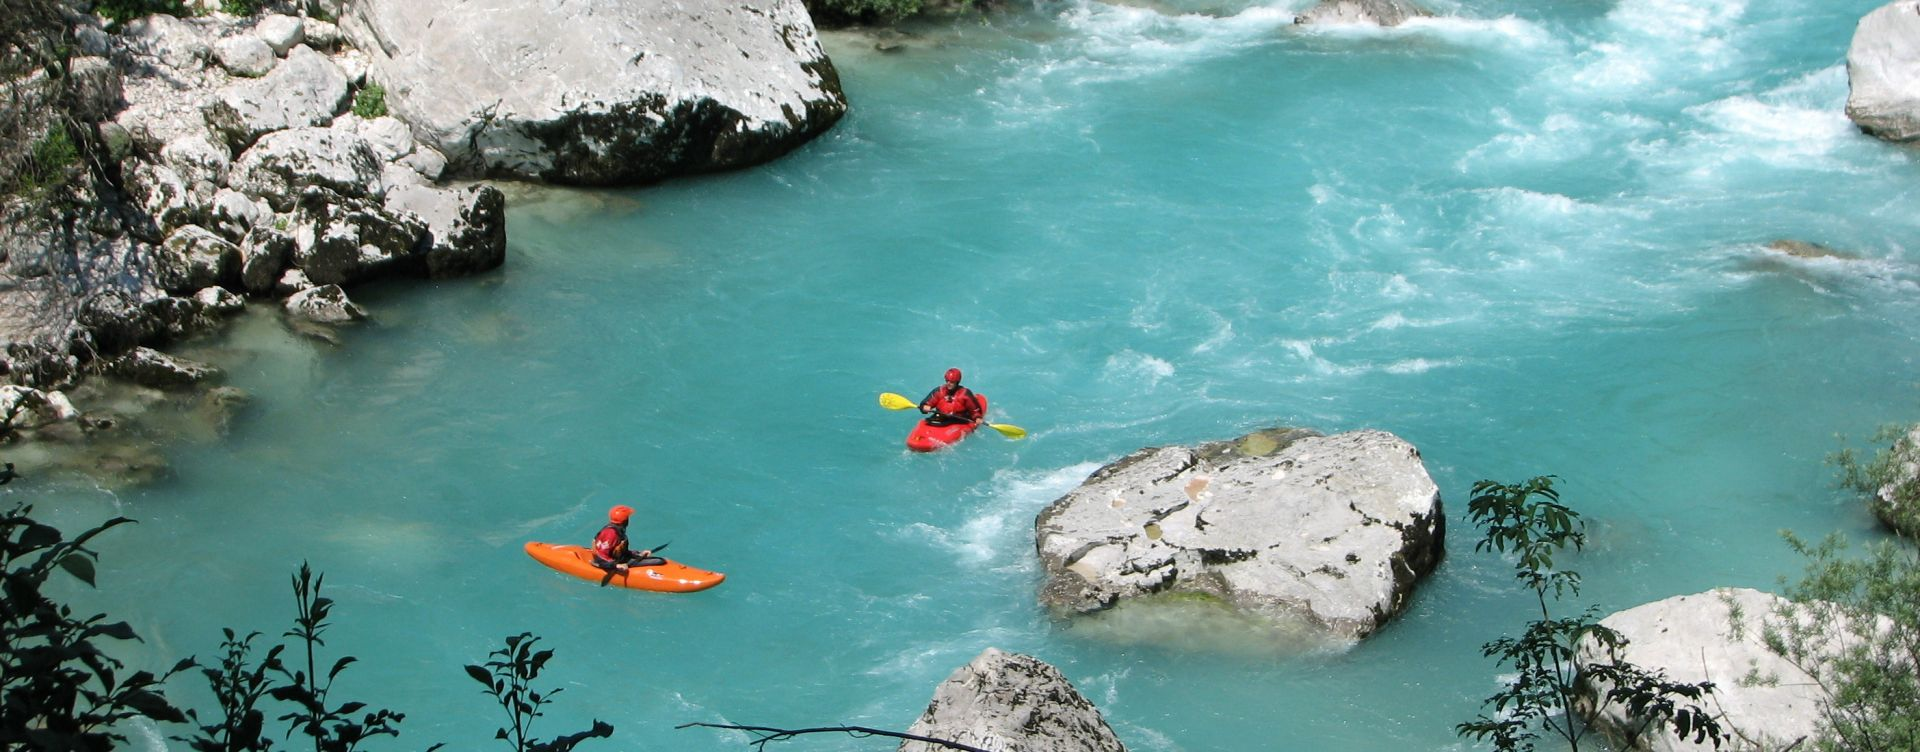 Kayaking Soca valley Slovenia